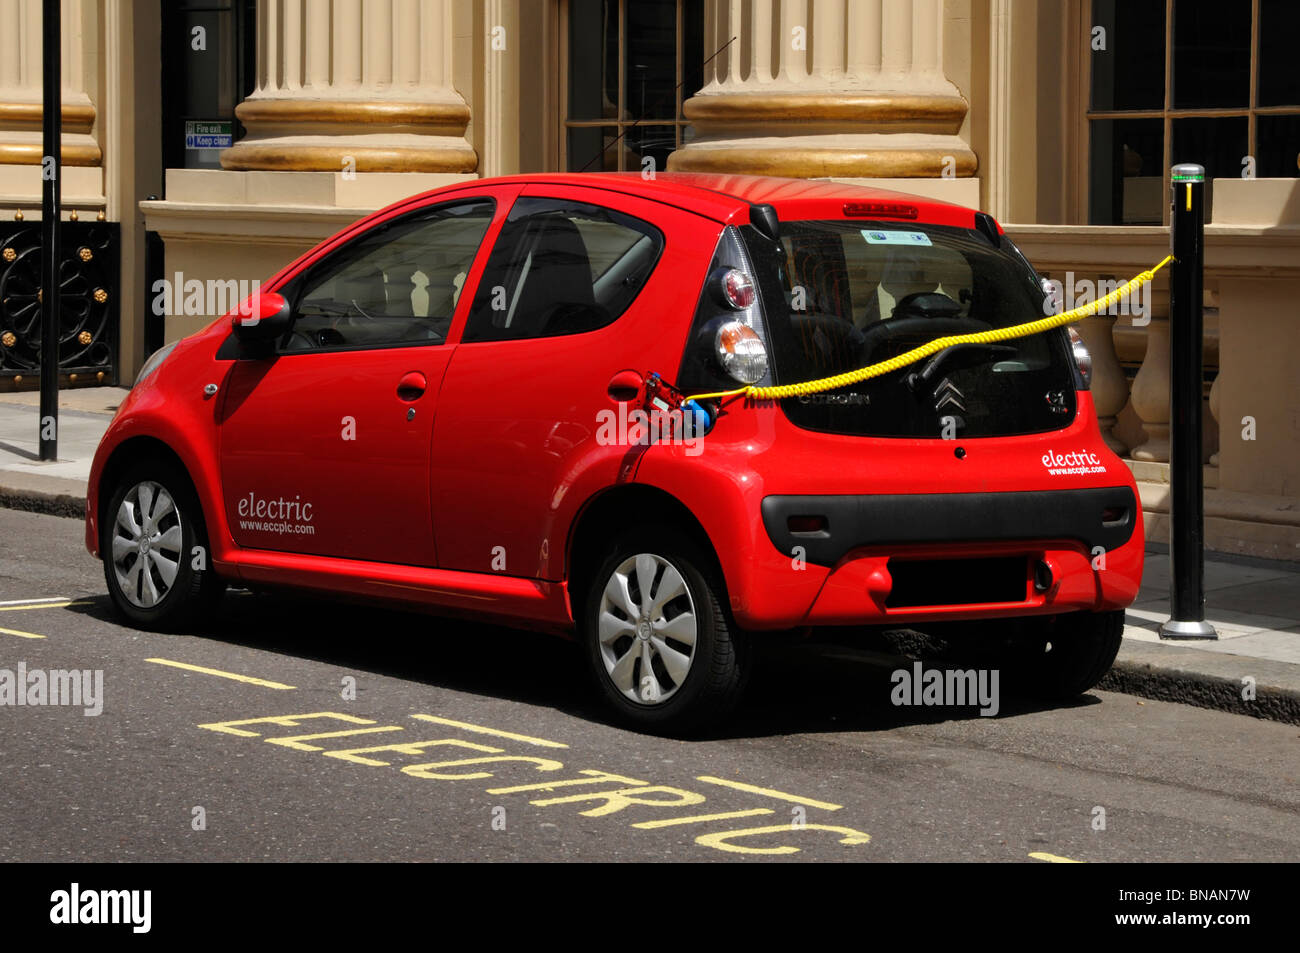 Make Charging Station Air Pollution Environment Issues May Make Electric Car Charging